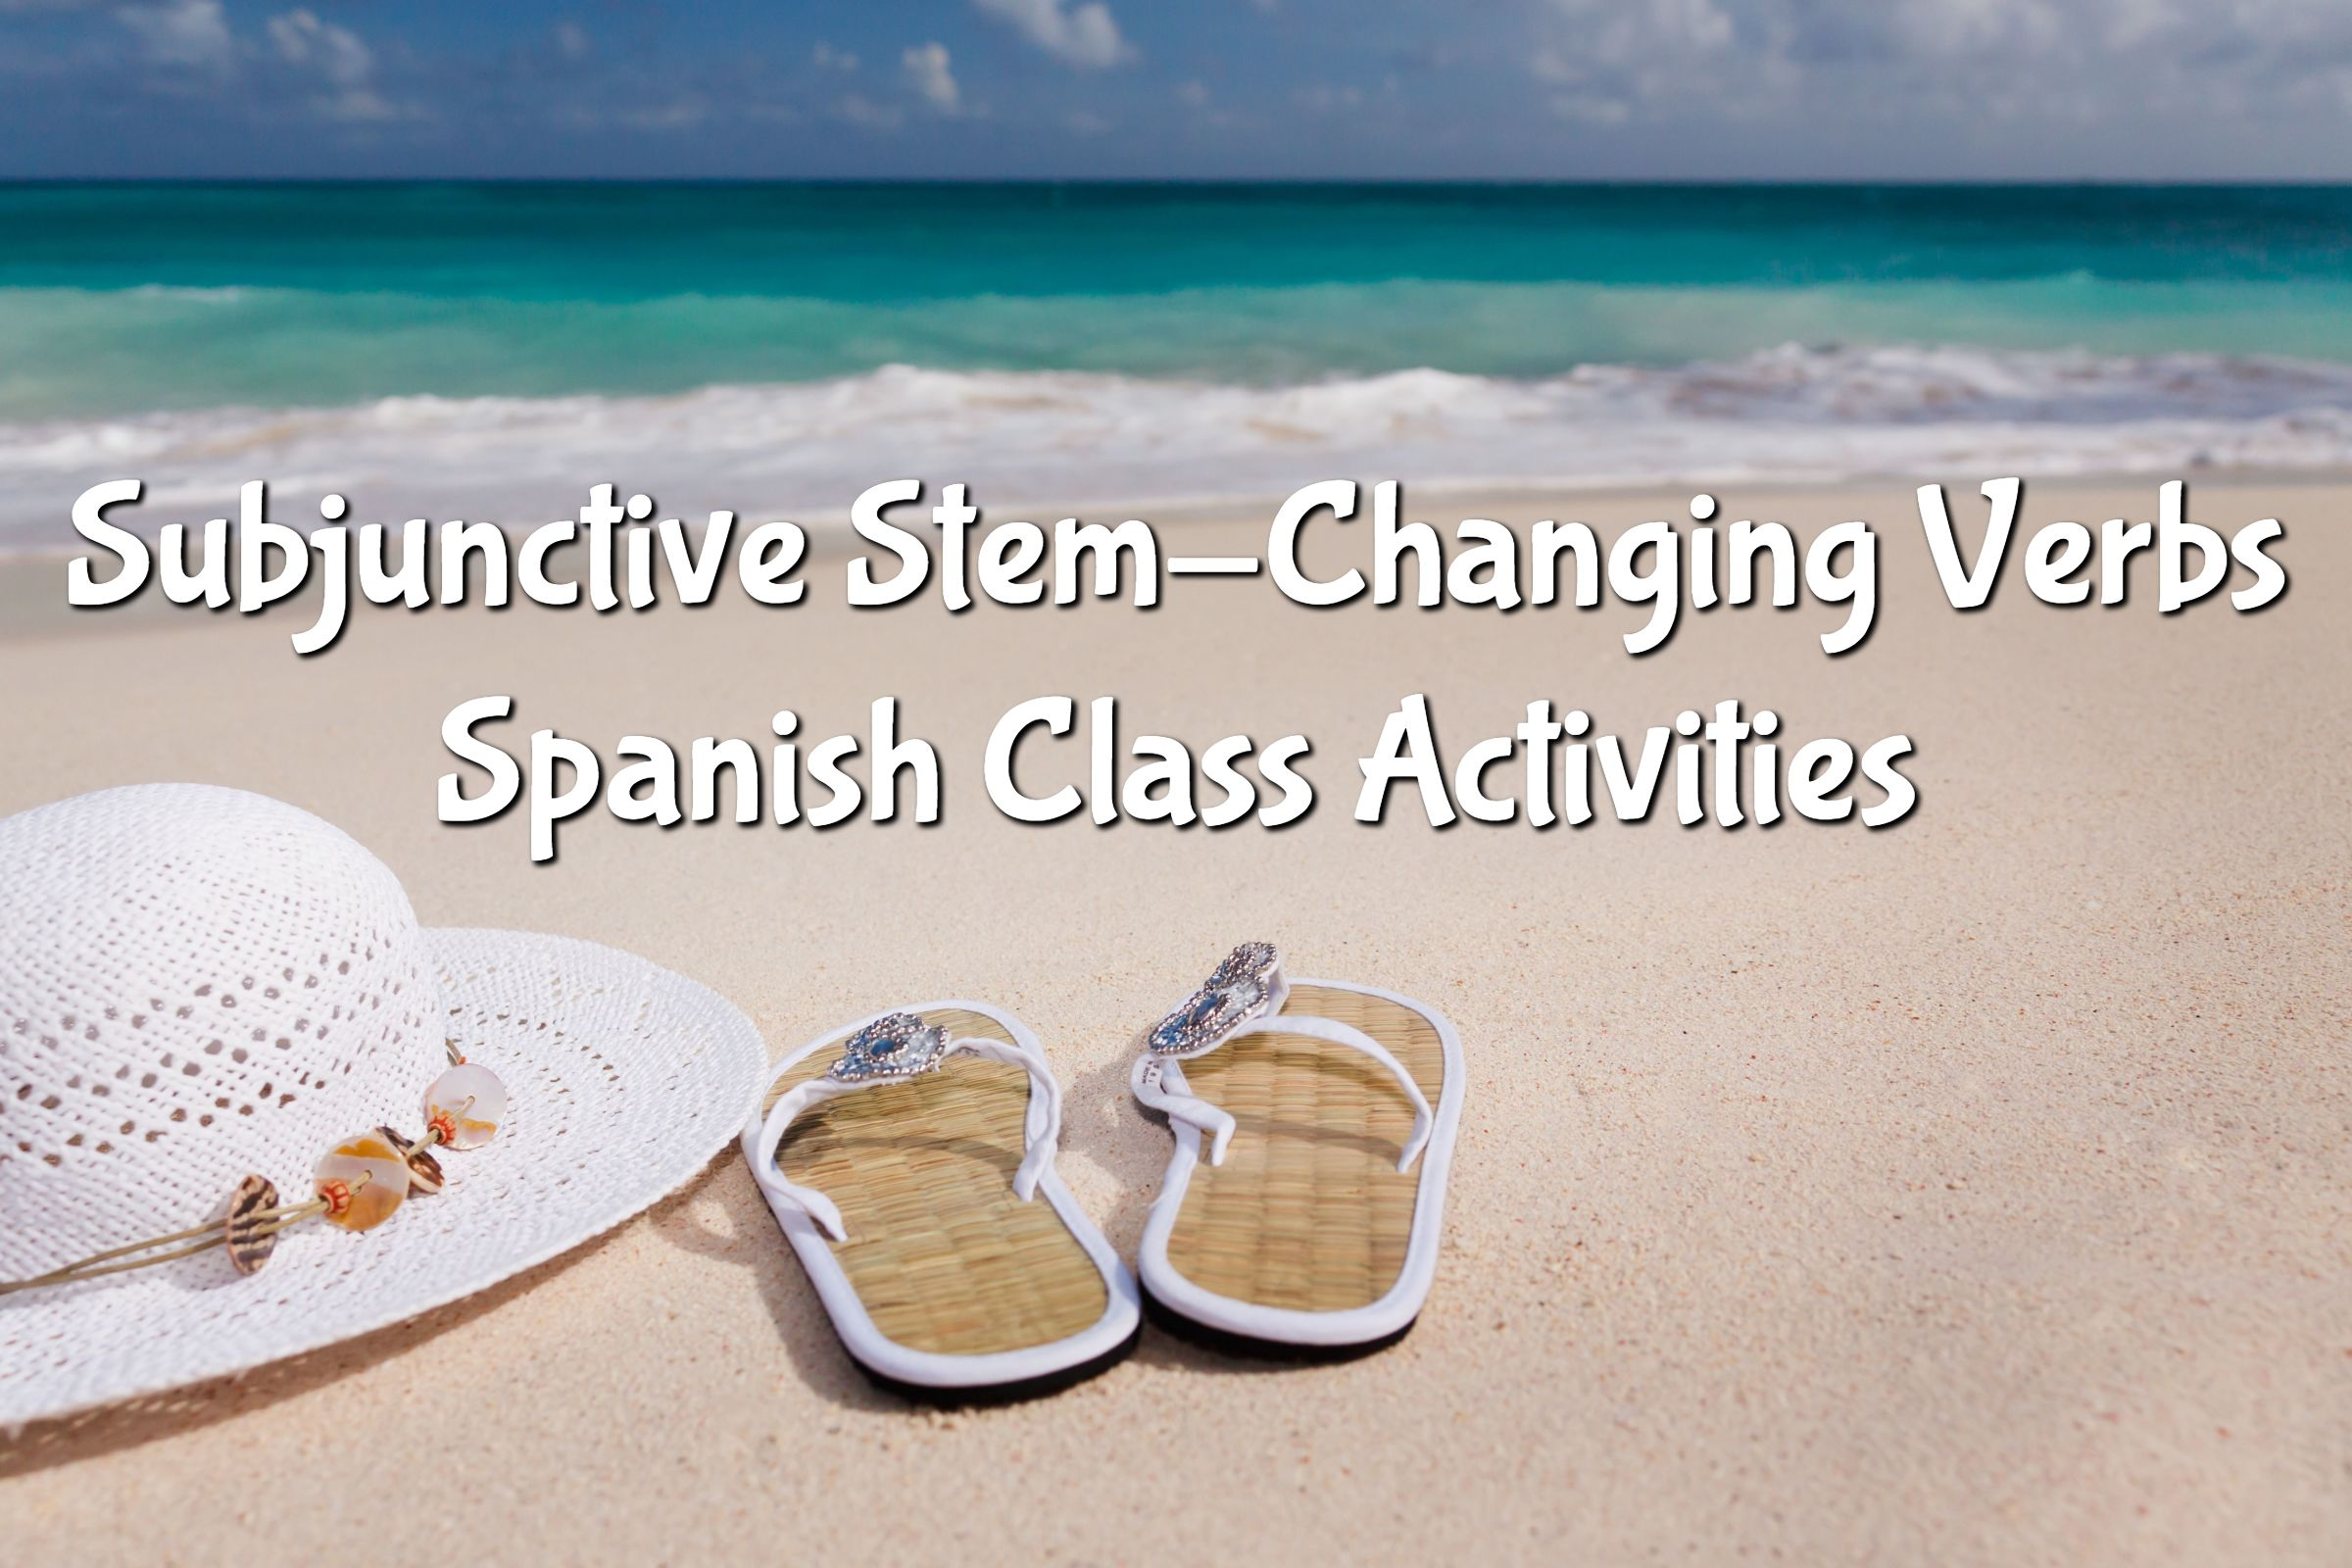 Subjunctive Stem Changing Verbs Spanish Class Activities